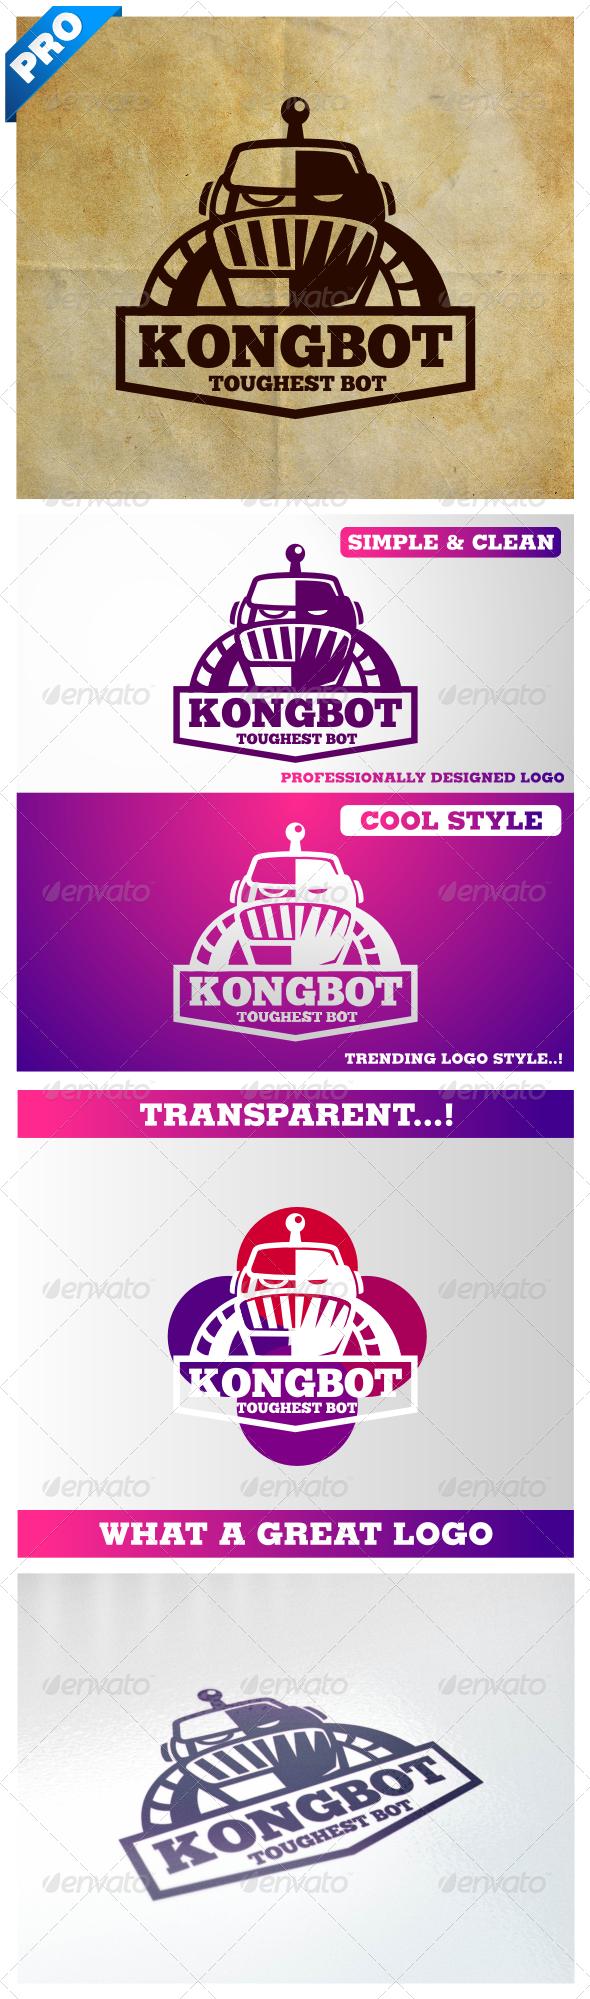 Vintage Retro Robot V.2 / Kongbot  - Vector Abstract